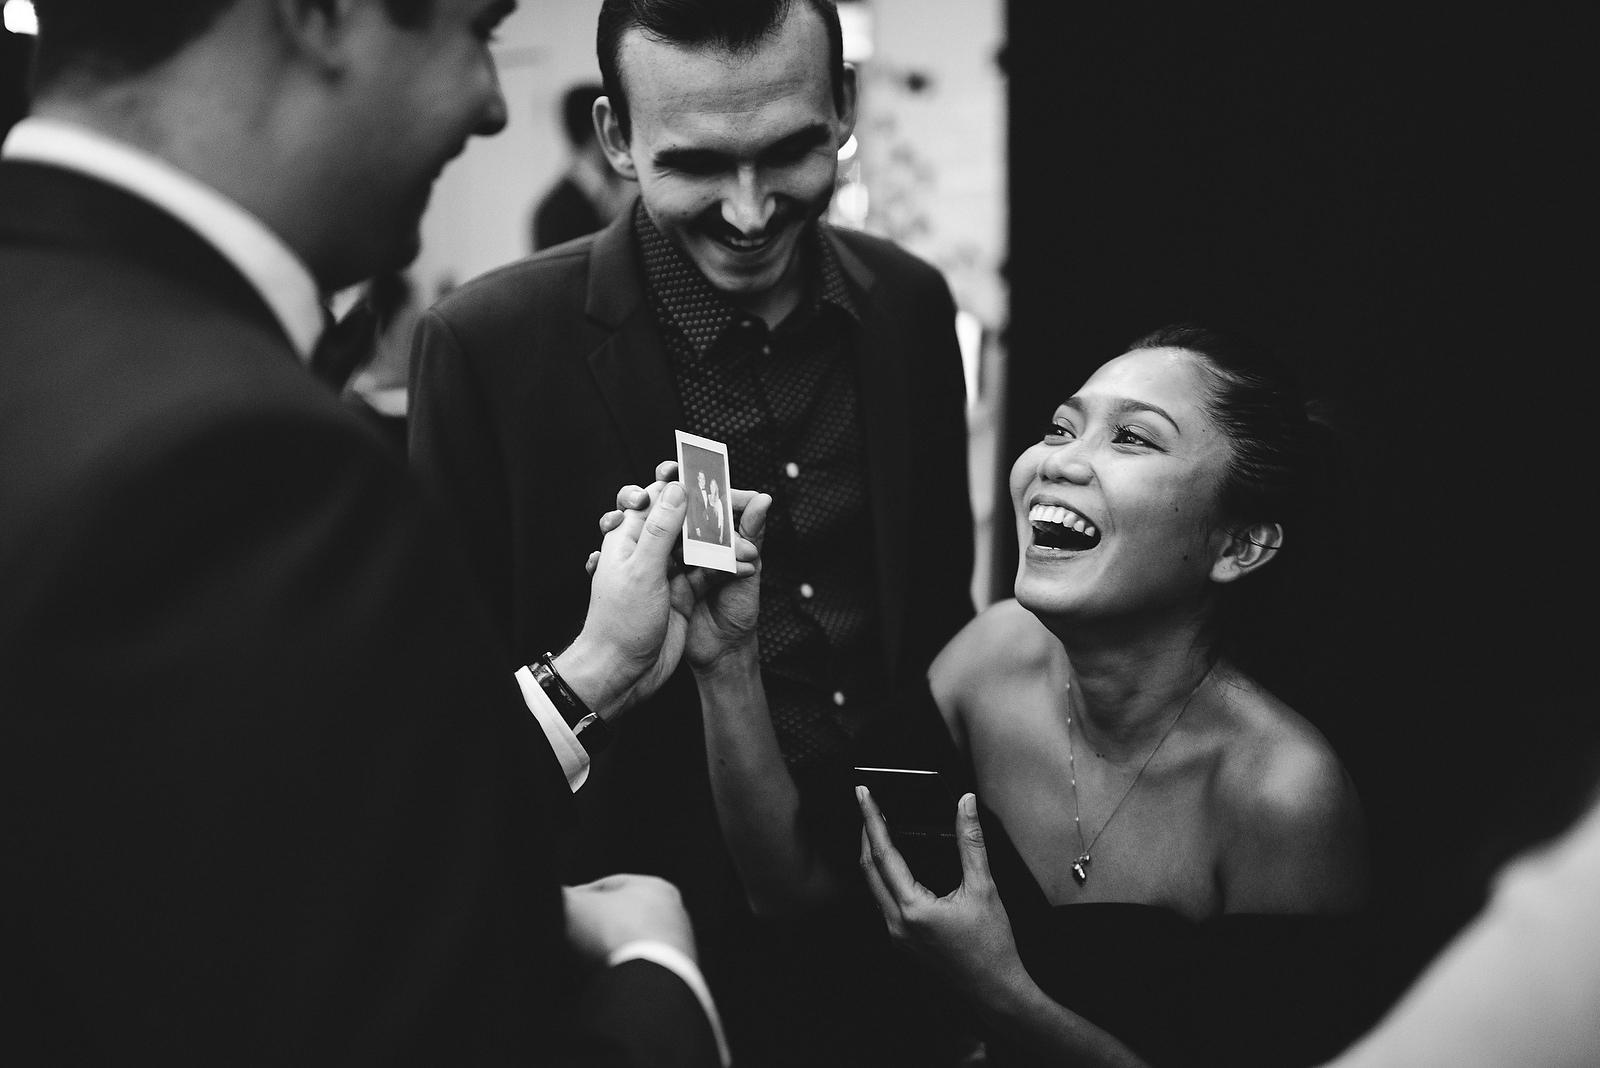 Fotograf Konstanz - Silvester Wedding in Hagnau / Friedrichshafen at Lake of Constance  - 42 -